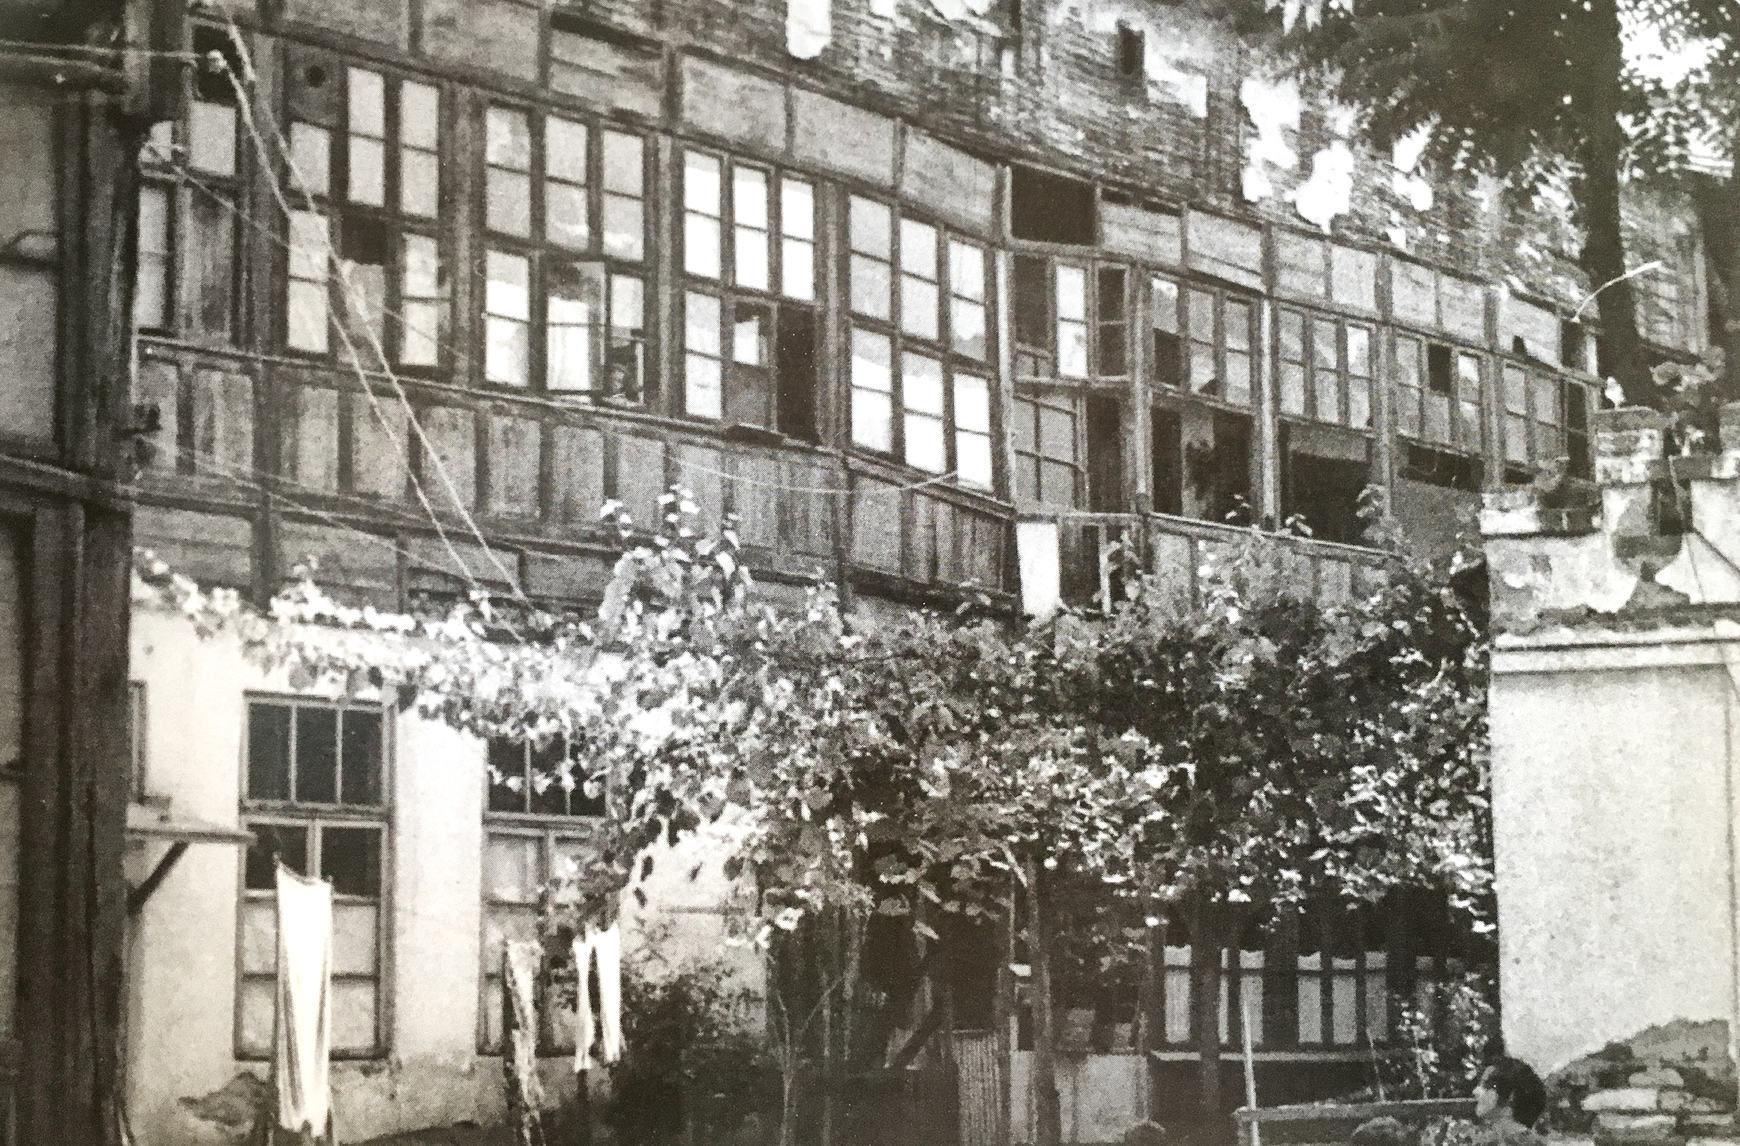 https://ahe-ro.s3.amazonaws.com/2020/rsz_extras_craiova-orasul_celor_o_mie_de_milionari_istoria_craiovei_intre_1800-2000_-_paul_rezeanu_2017.jpg